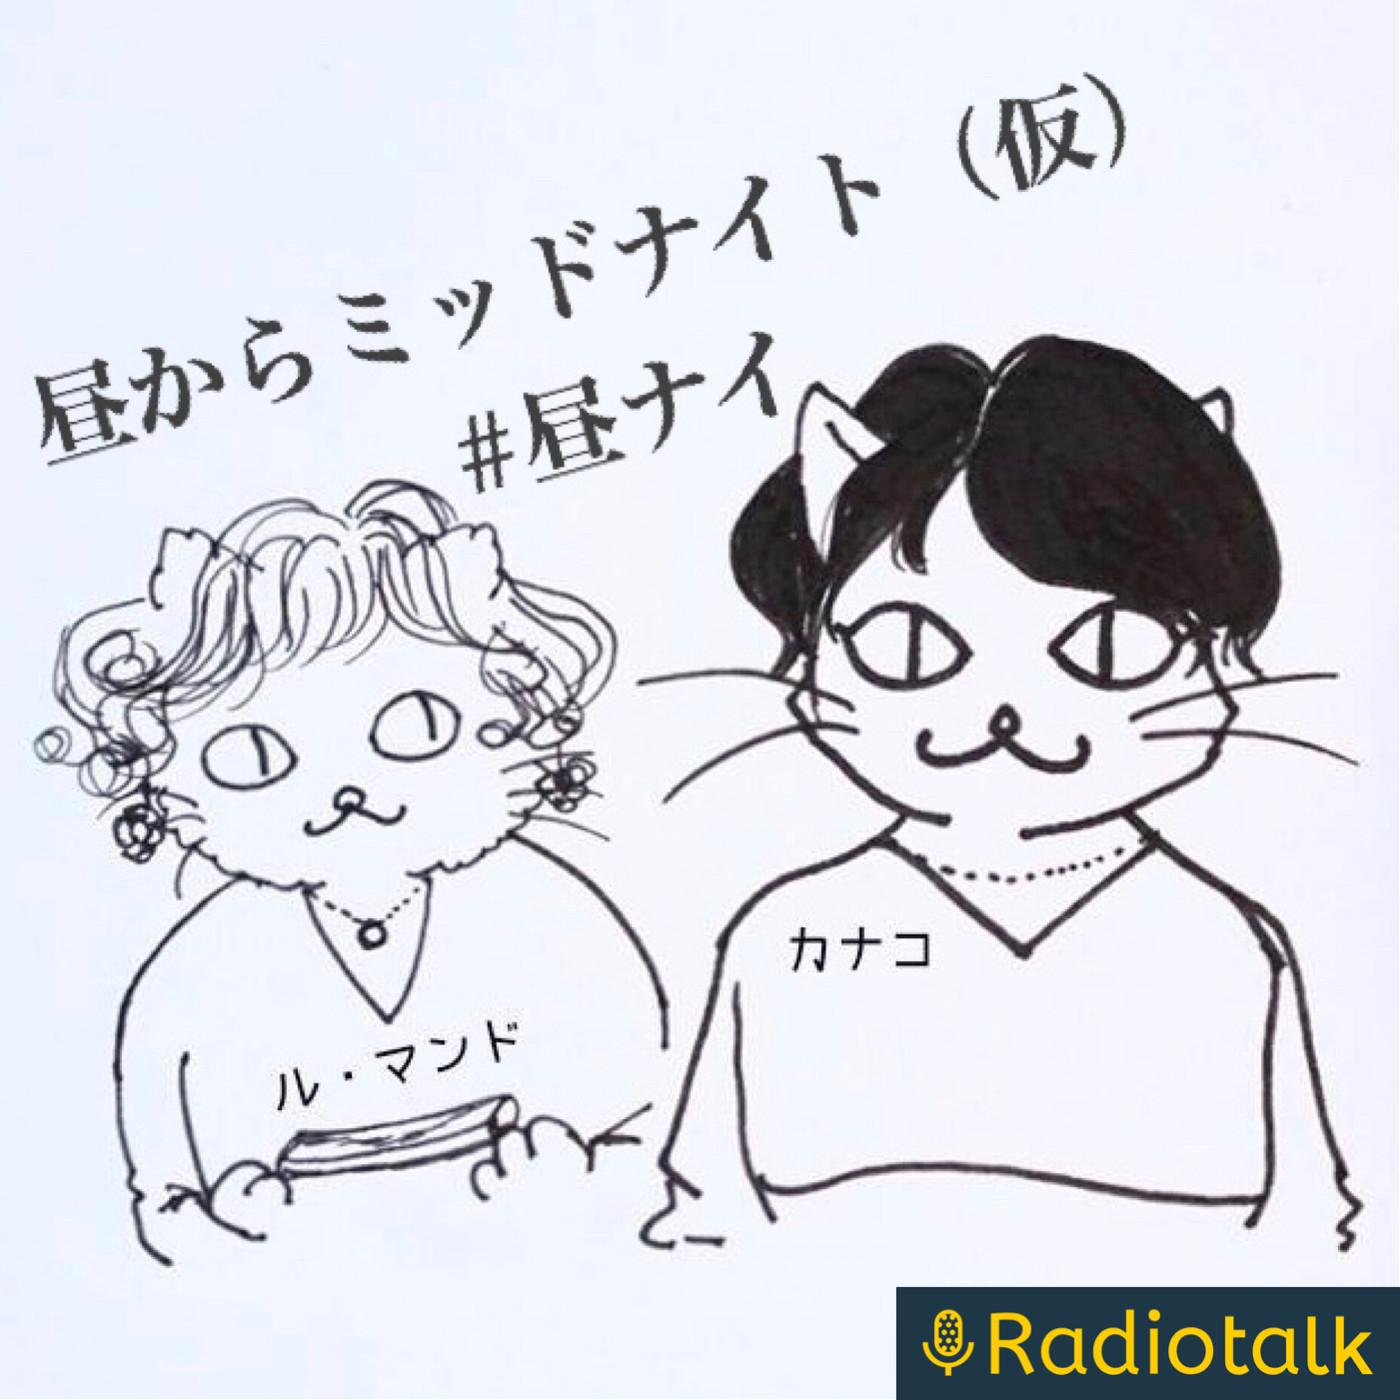 #582 ??????????????????? from Radiotalk